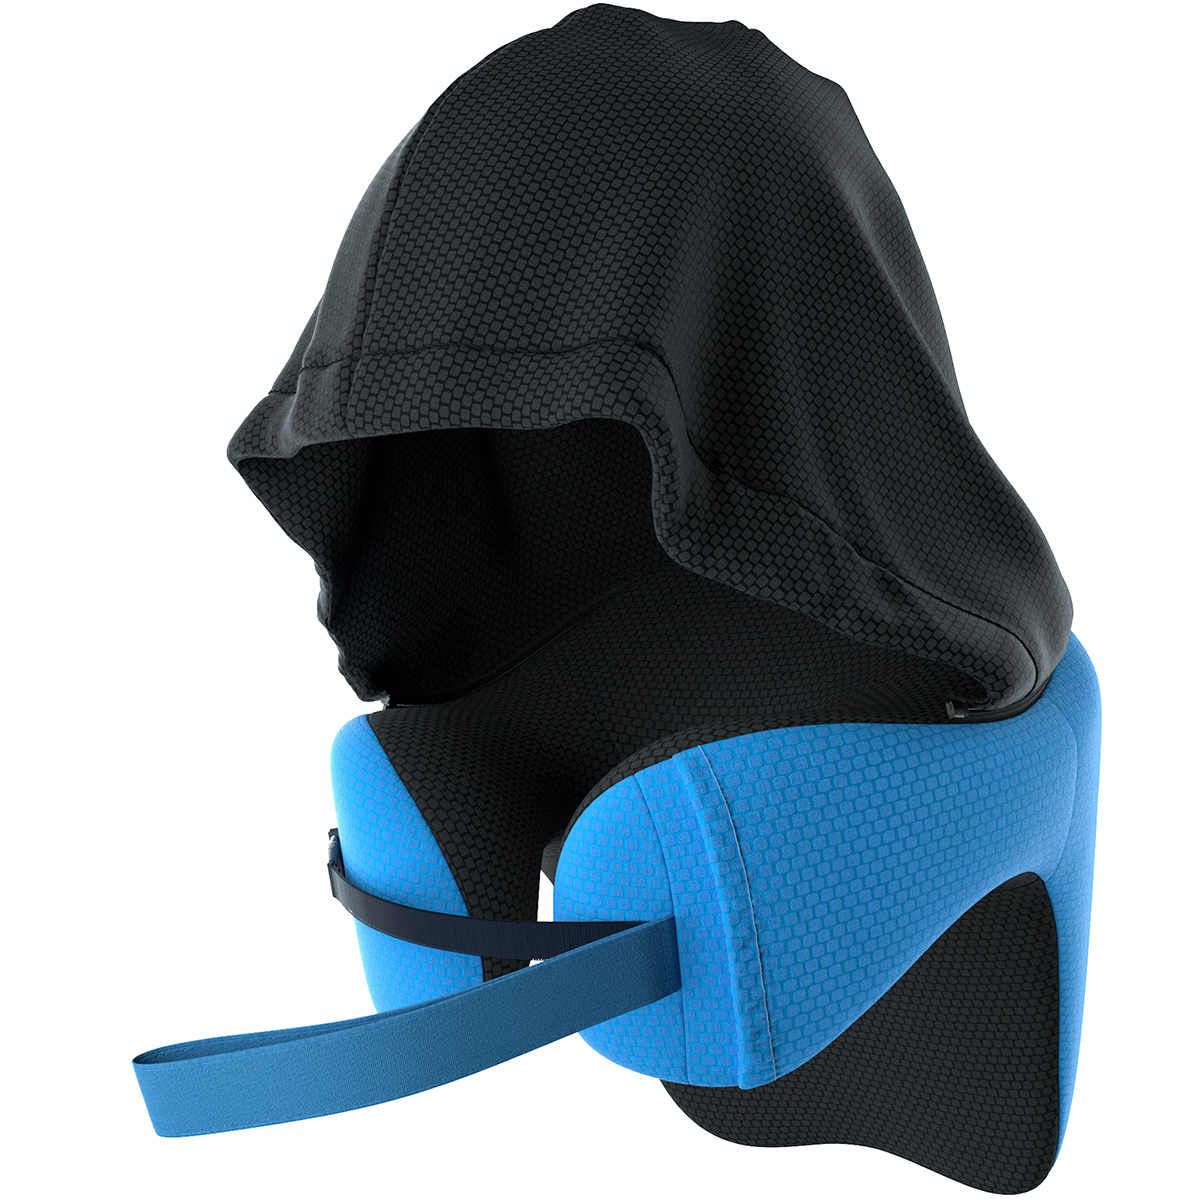 LANGRIA 6 · イン · 1 長距離低反発トラベル枕取り外し可能なフード調節可能な首枕旅行車昼寝レストクッション